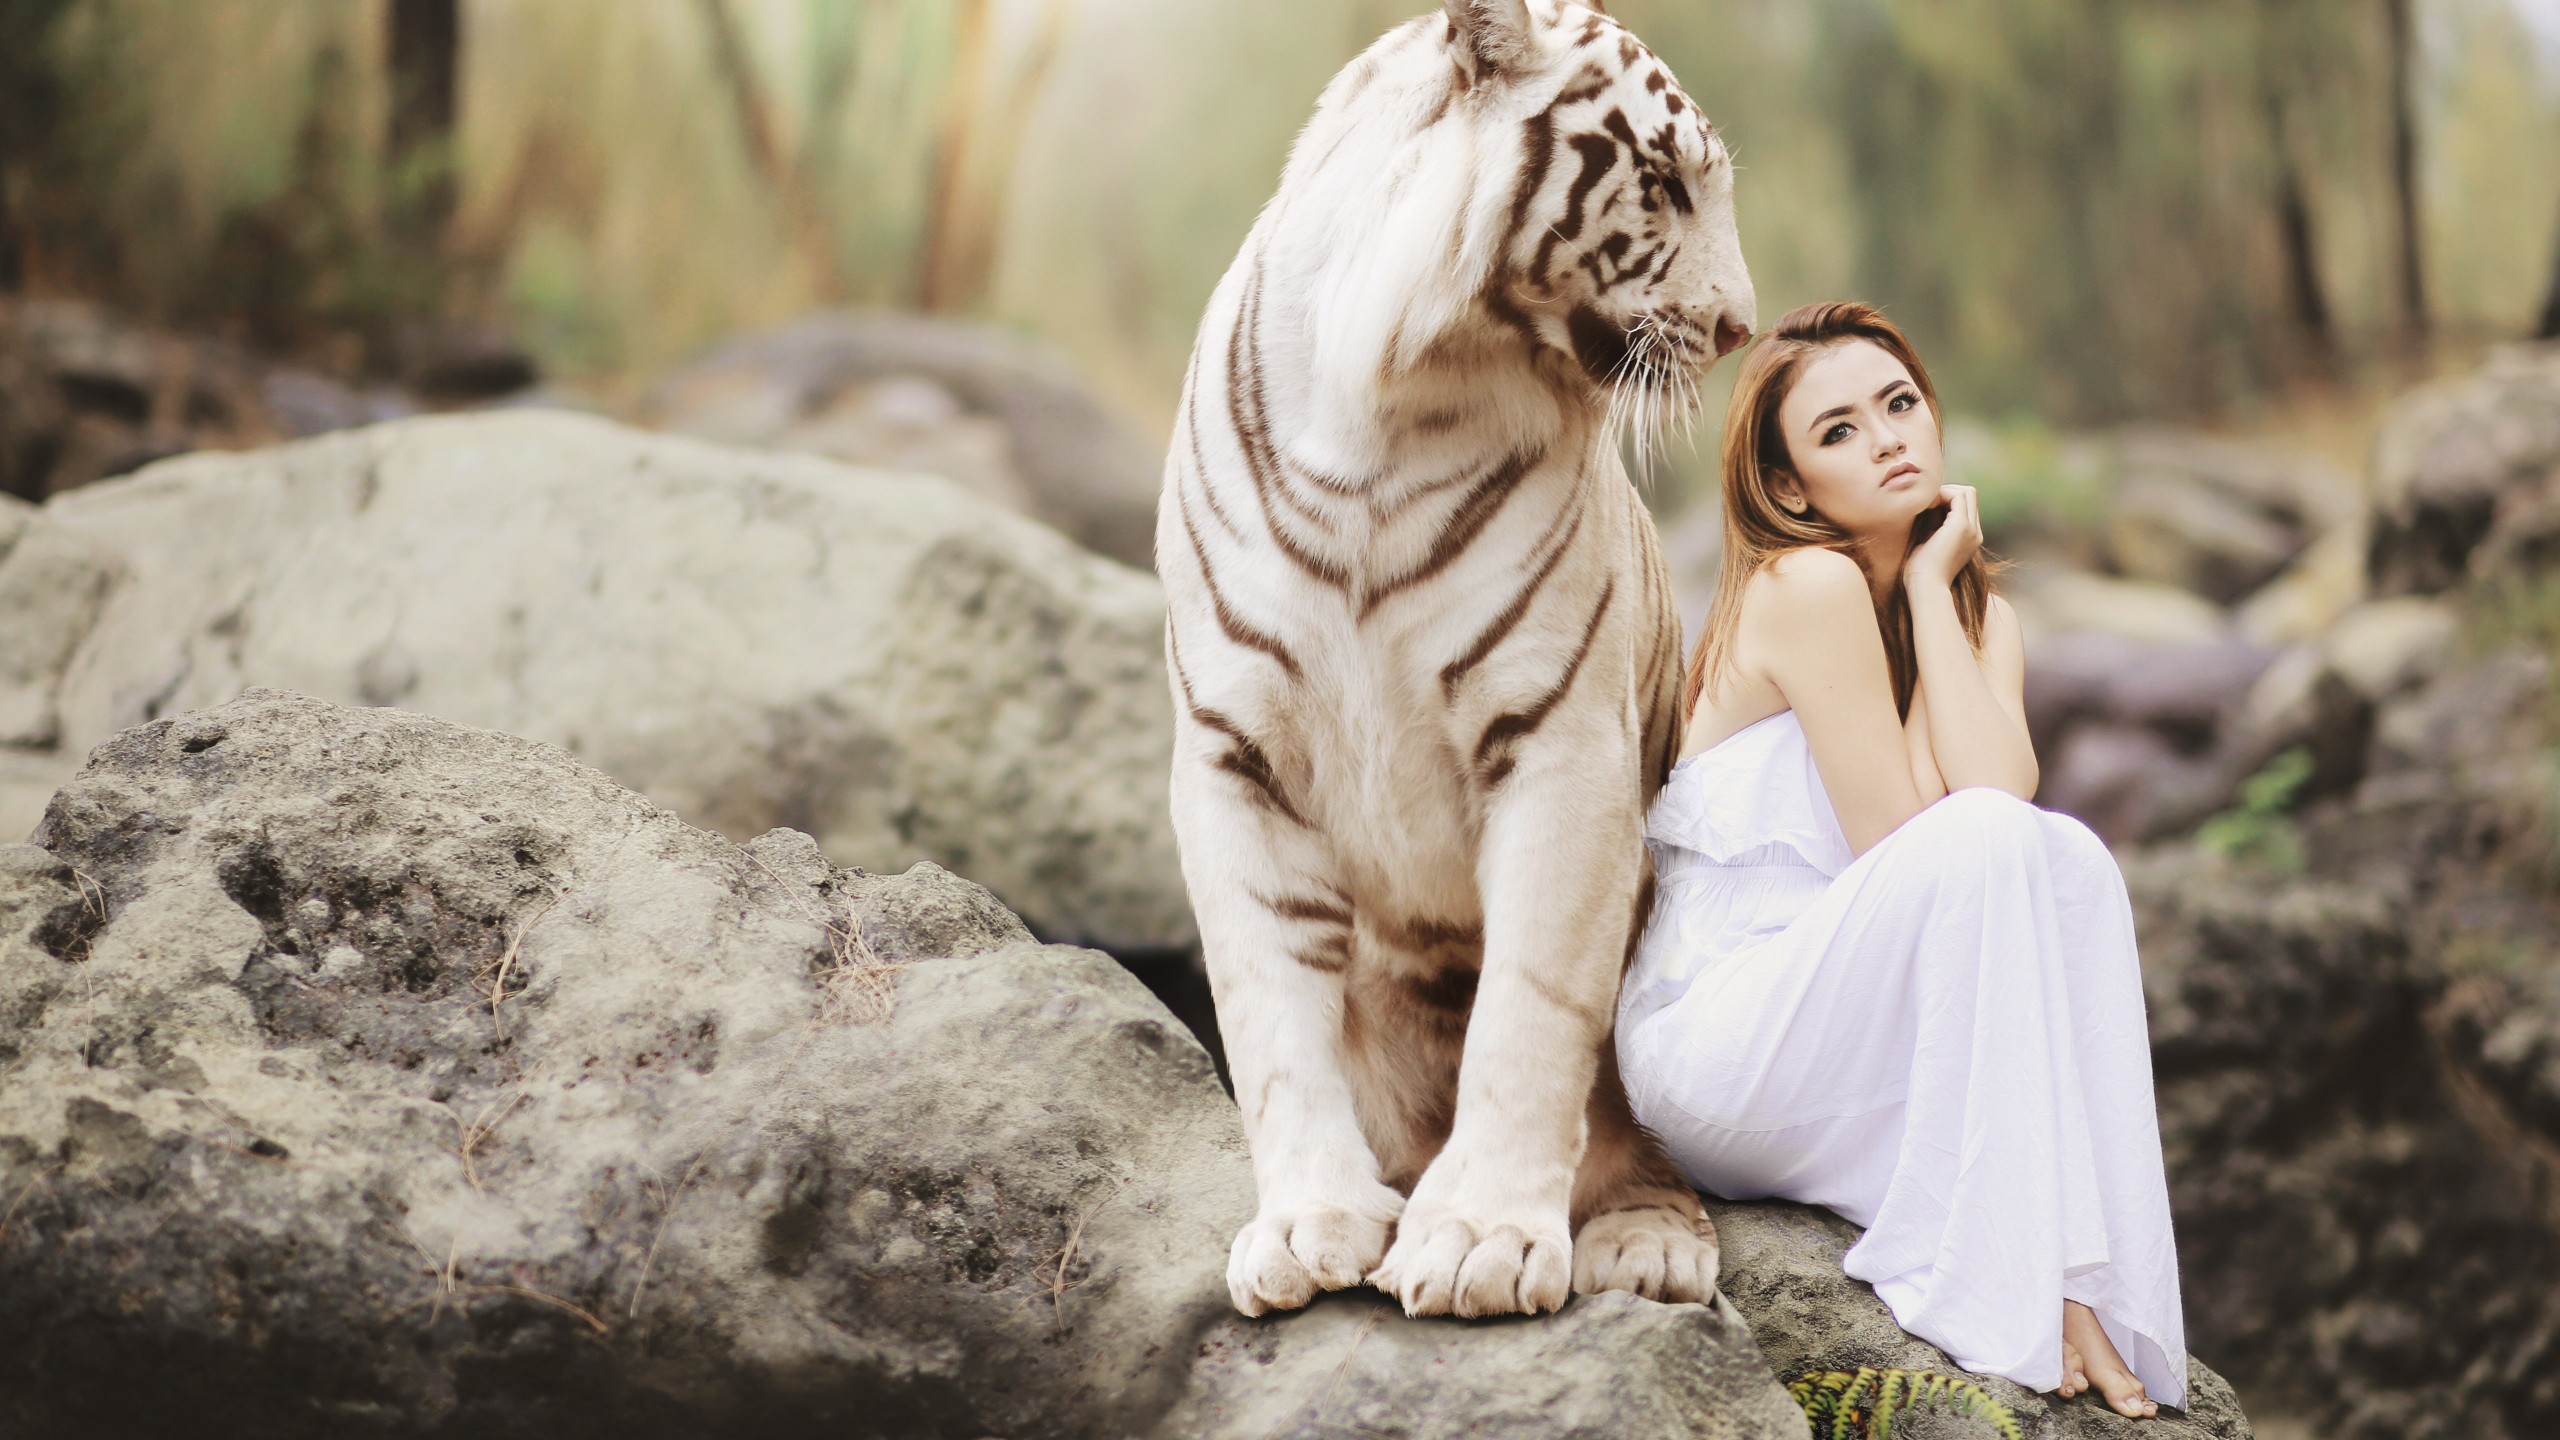 Bengal Tiger And A Beautiful Girl Wallpaper - Ultra Hd White Tiger 4k - HD Wallpaper